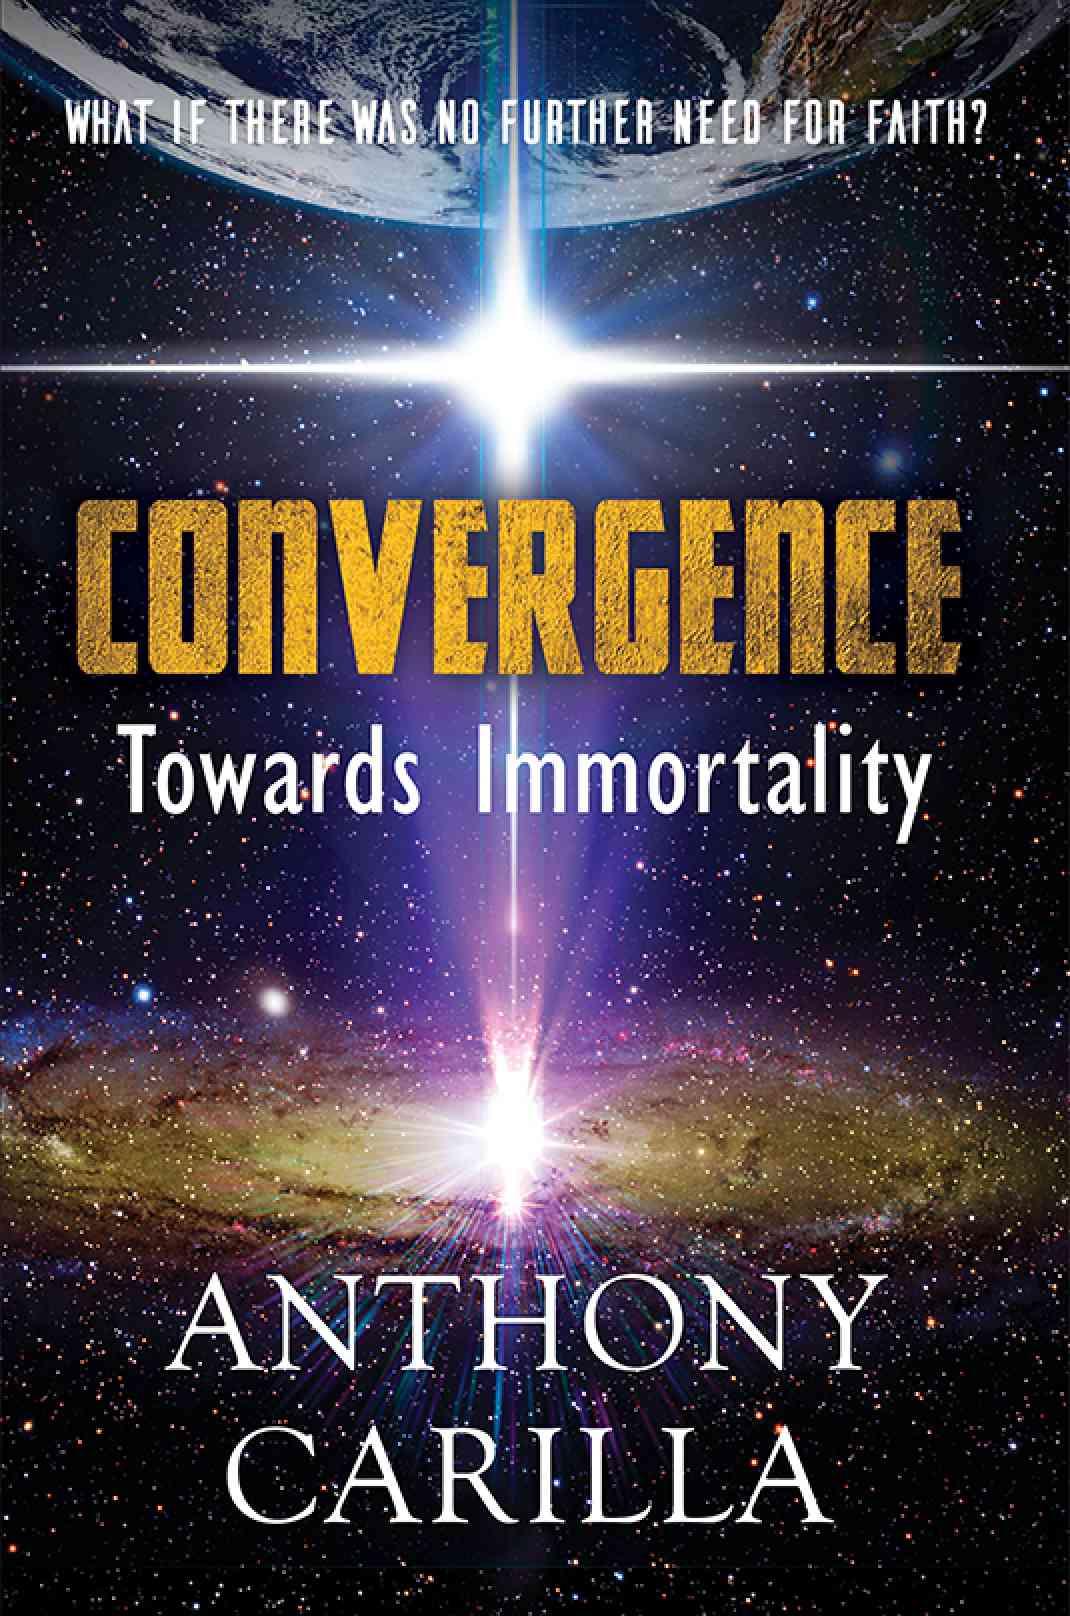 Convergence: Towards Immortality